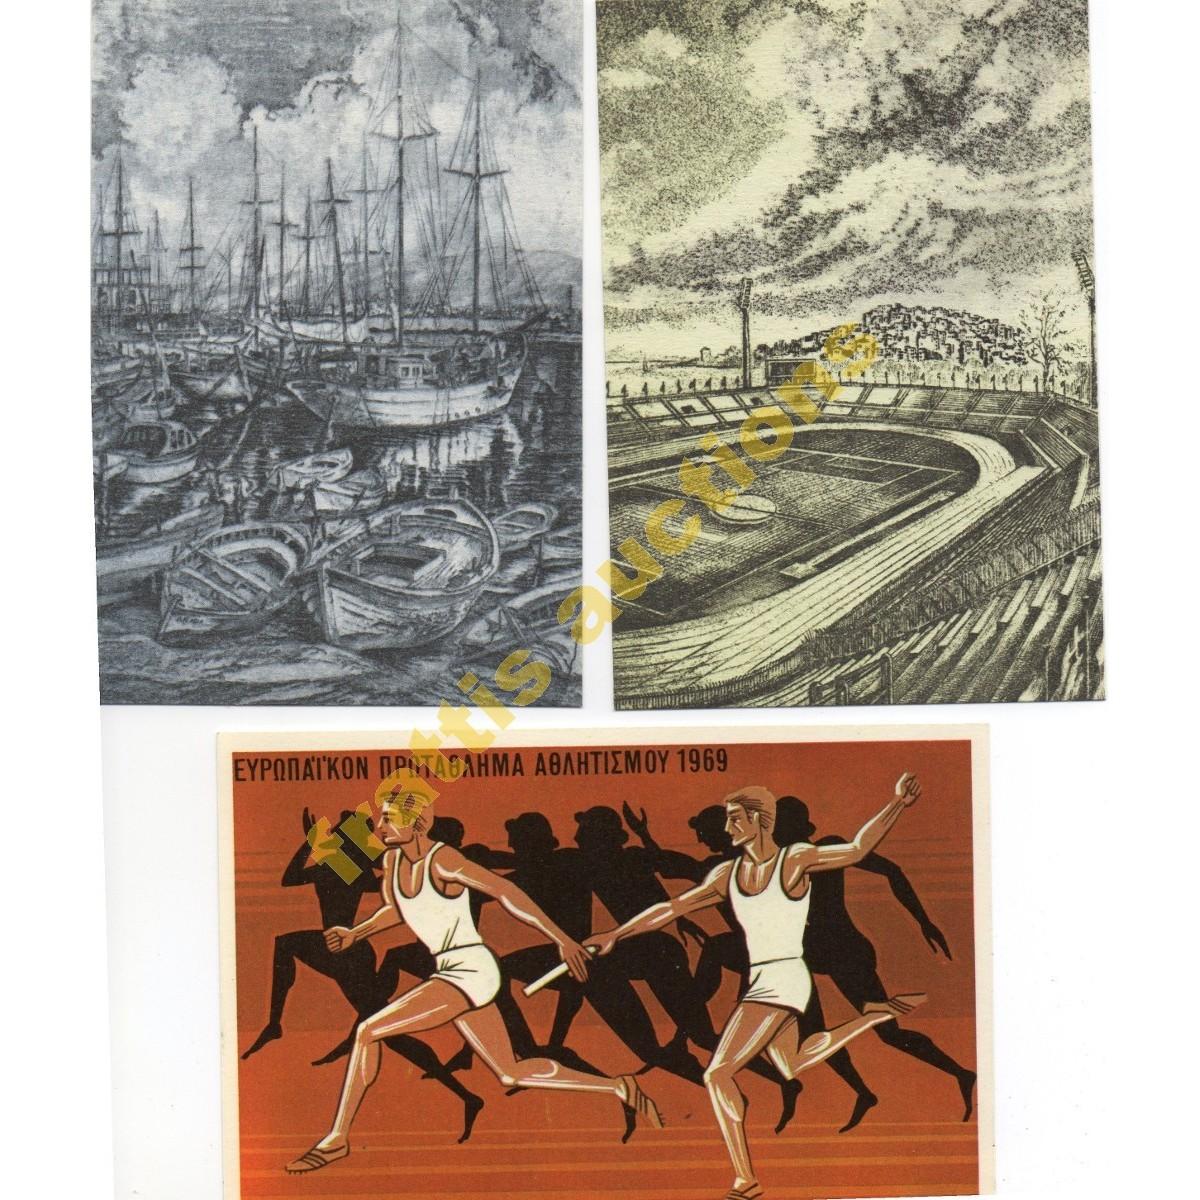 IX EUROPIAN CHAMPIONSHIP ATHENS 1969, 4 postcardς+φάκελος